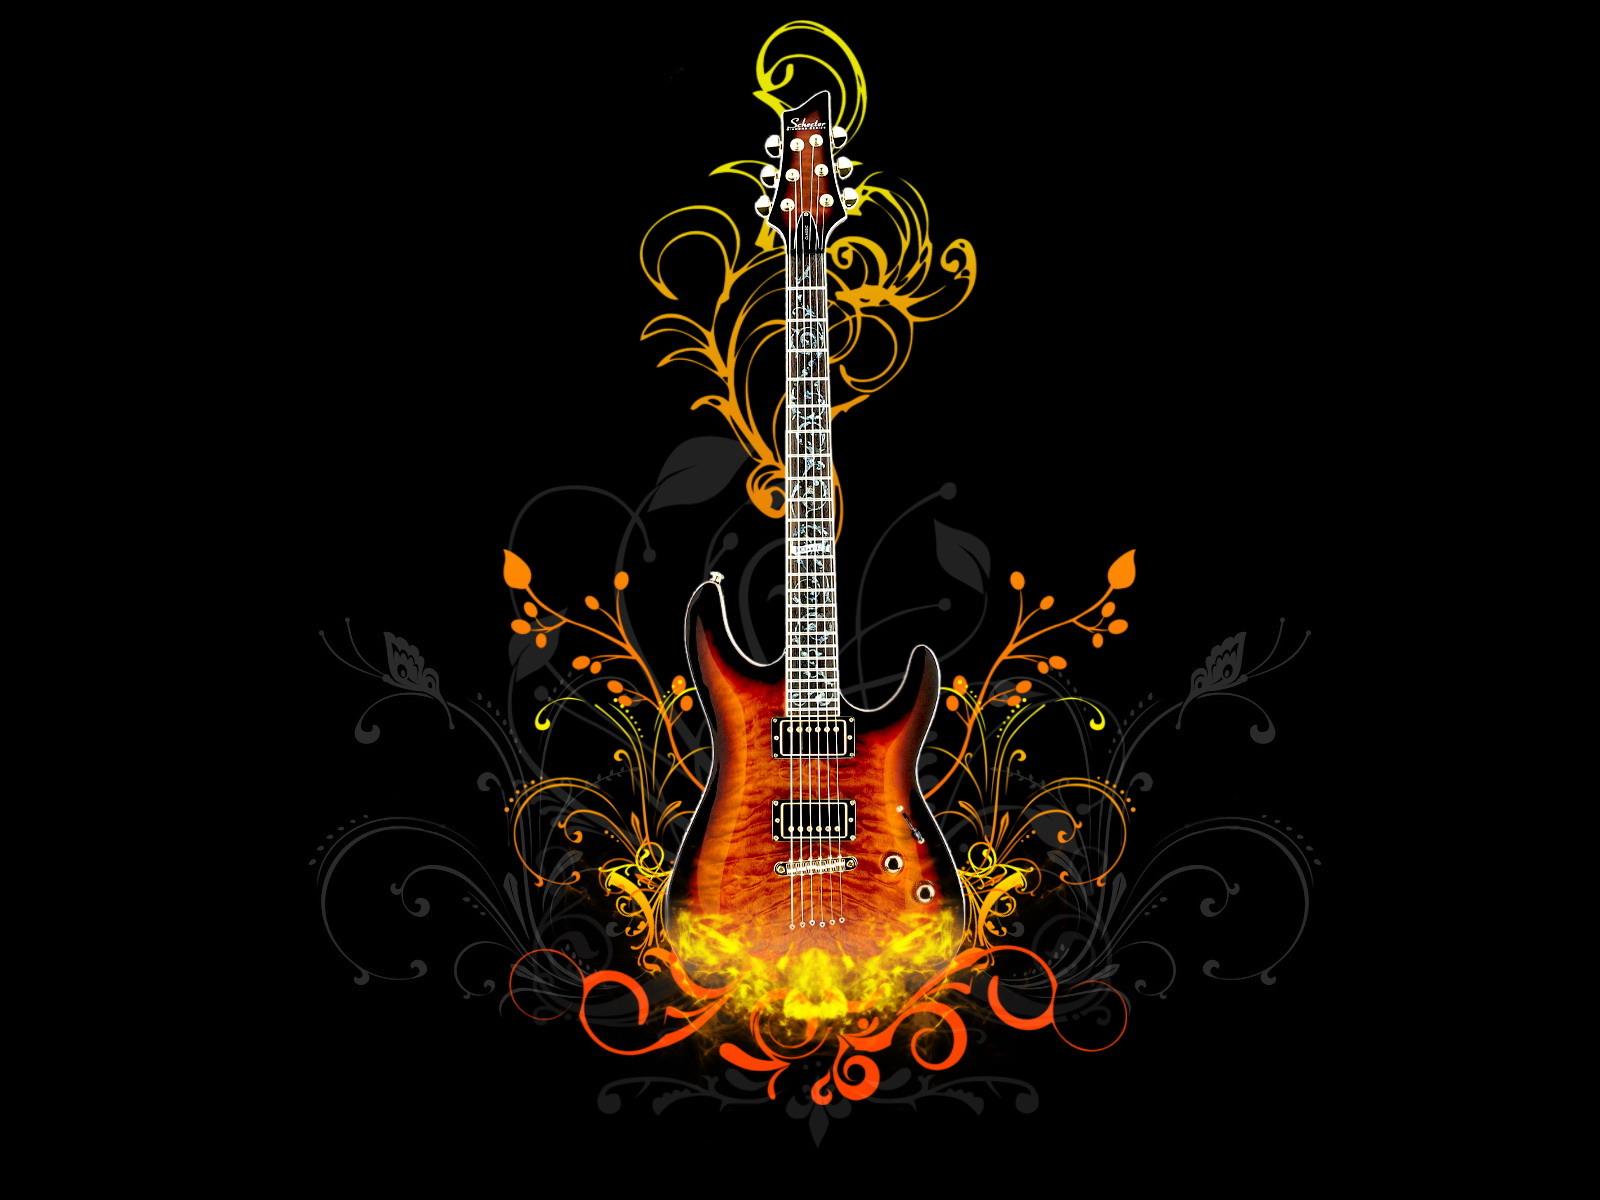 http://1.bp.blogspot.com/_RIdrXDL9rjI/TFjlzrW0k_I/AAAAAAAAAAc/w2us_E4opyA/s1600/Guitar.jpg